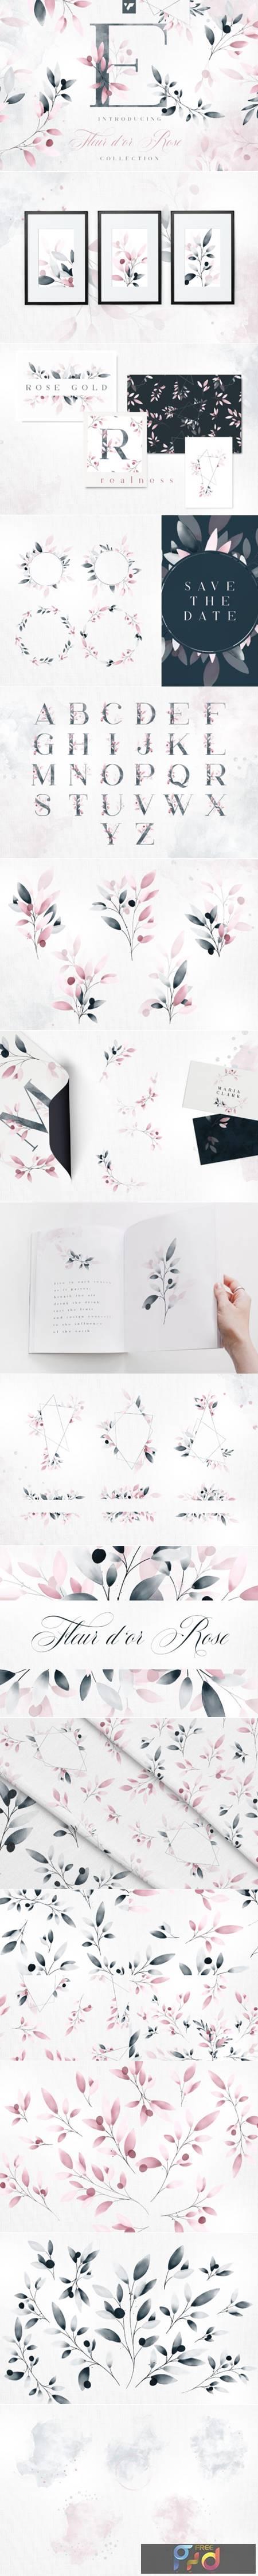 Fleur Dor Rose Graphic Collection 8639201 1